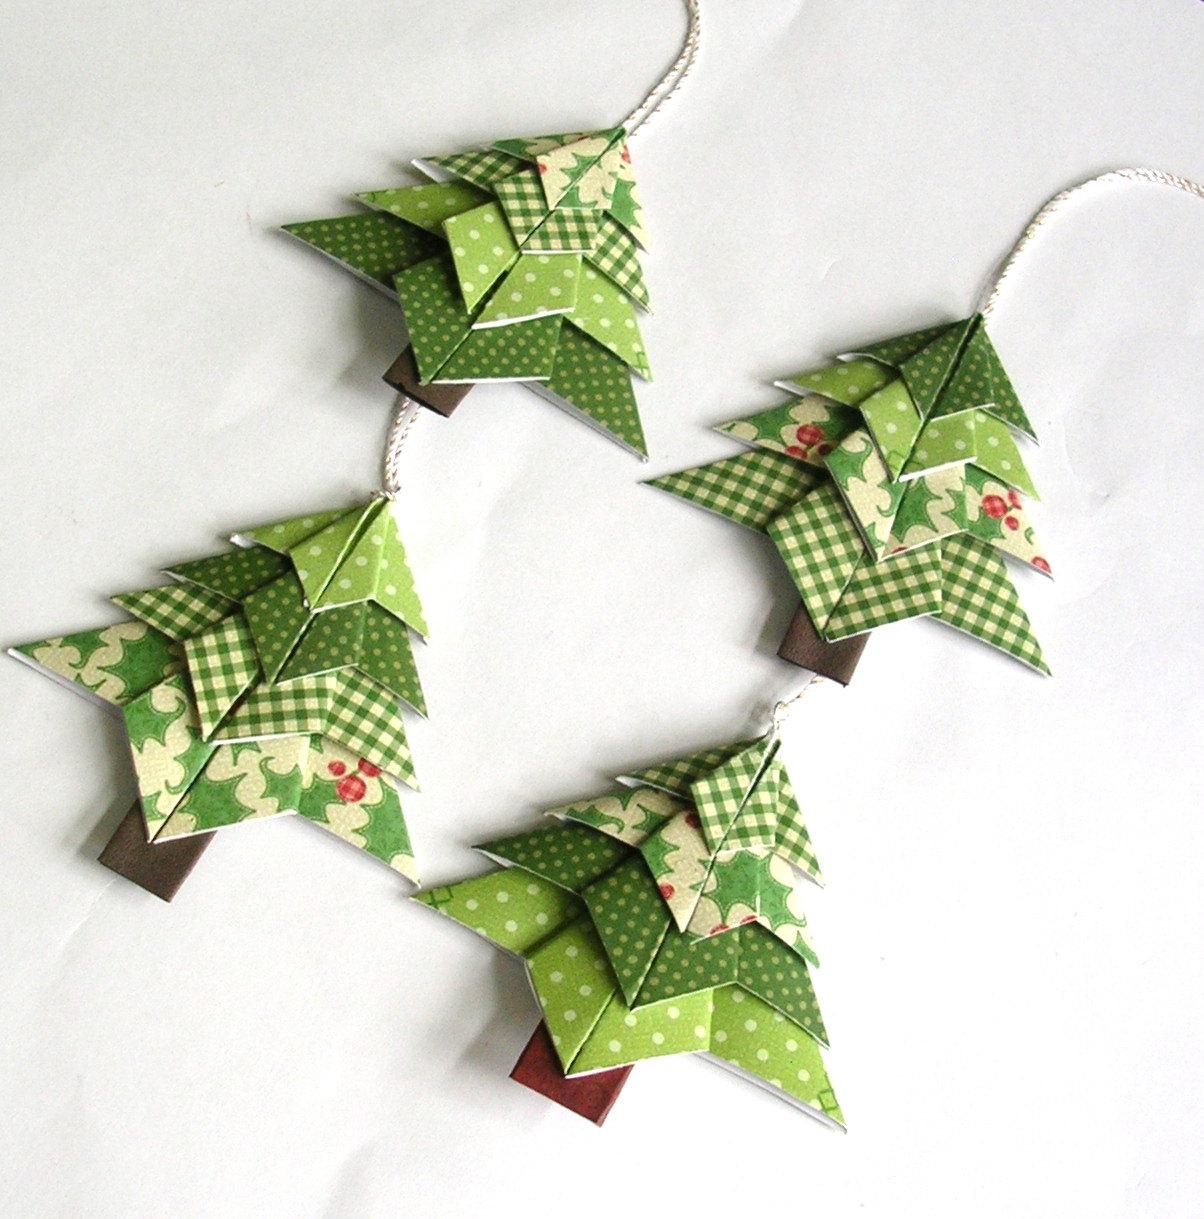 Unique Christmas Craft Ideas Part - 25: Top 40 DIY Christmas Gift Ideas That Moms Will Love U2013 Christmas Celebration